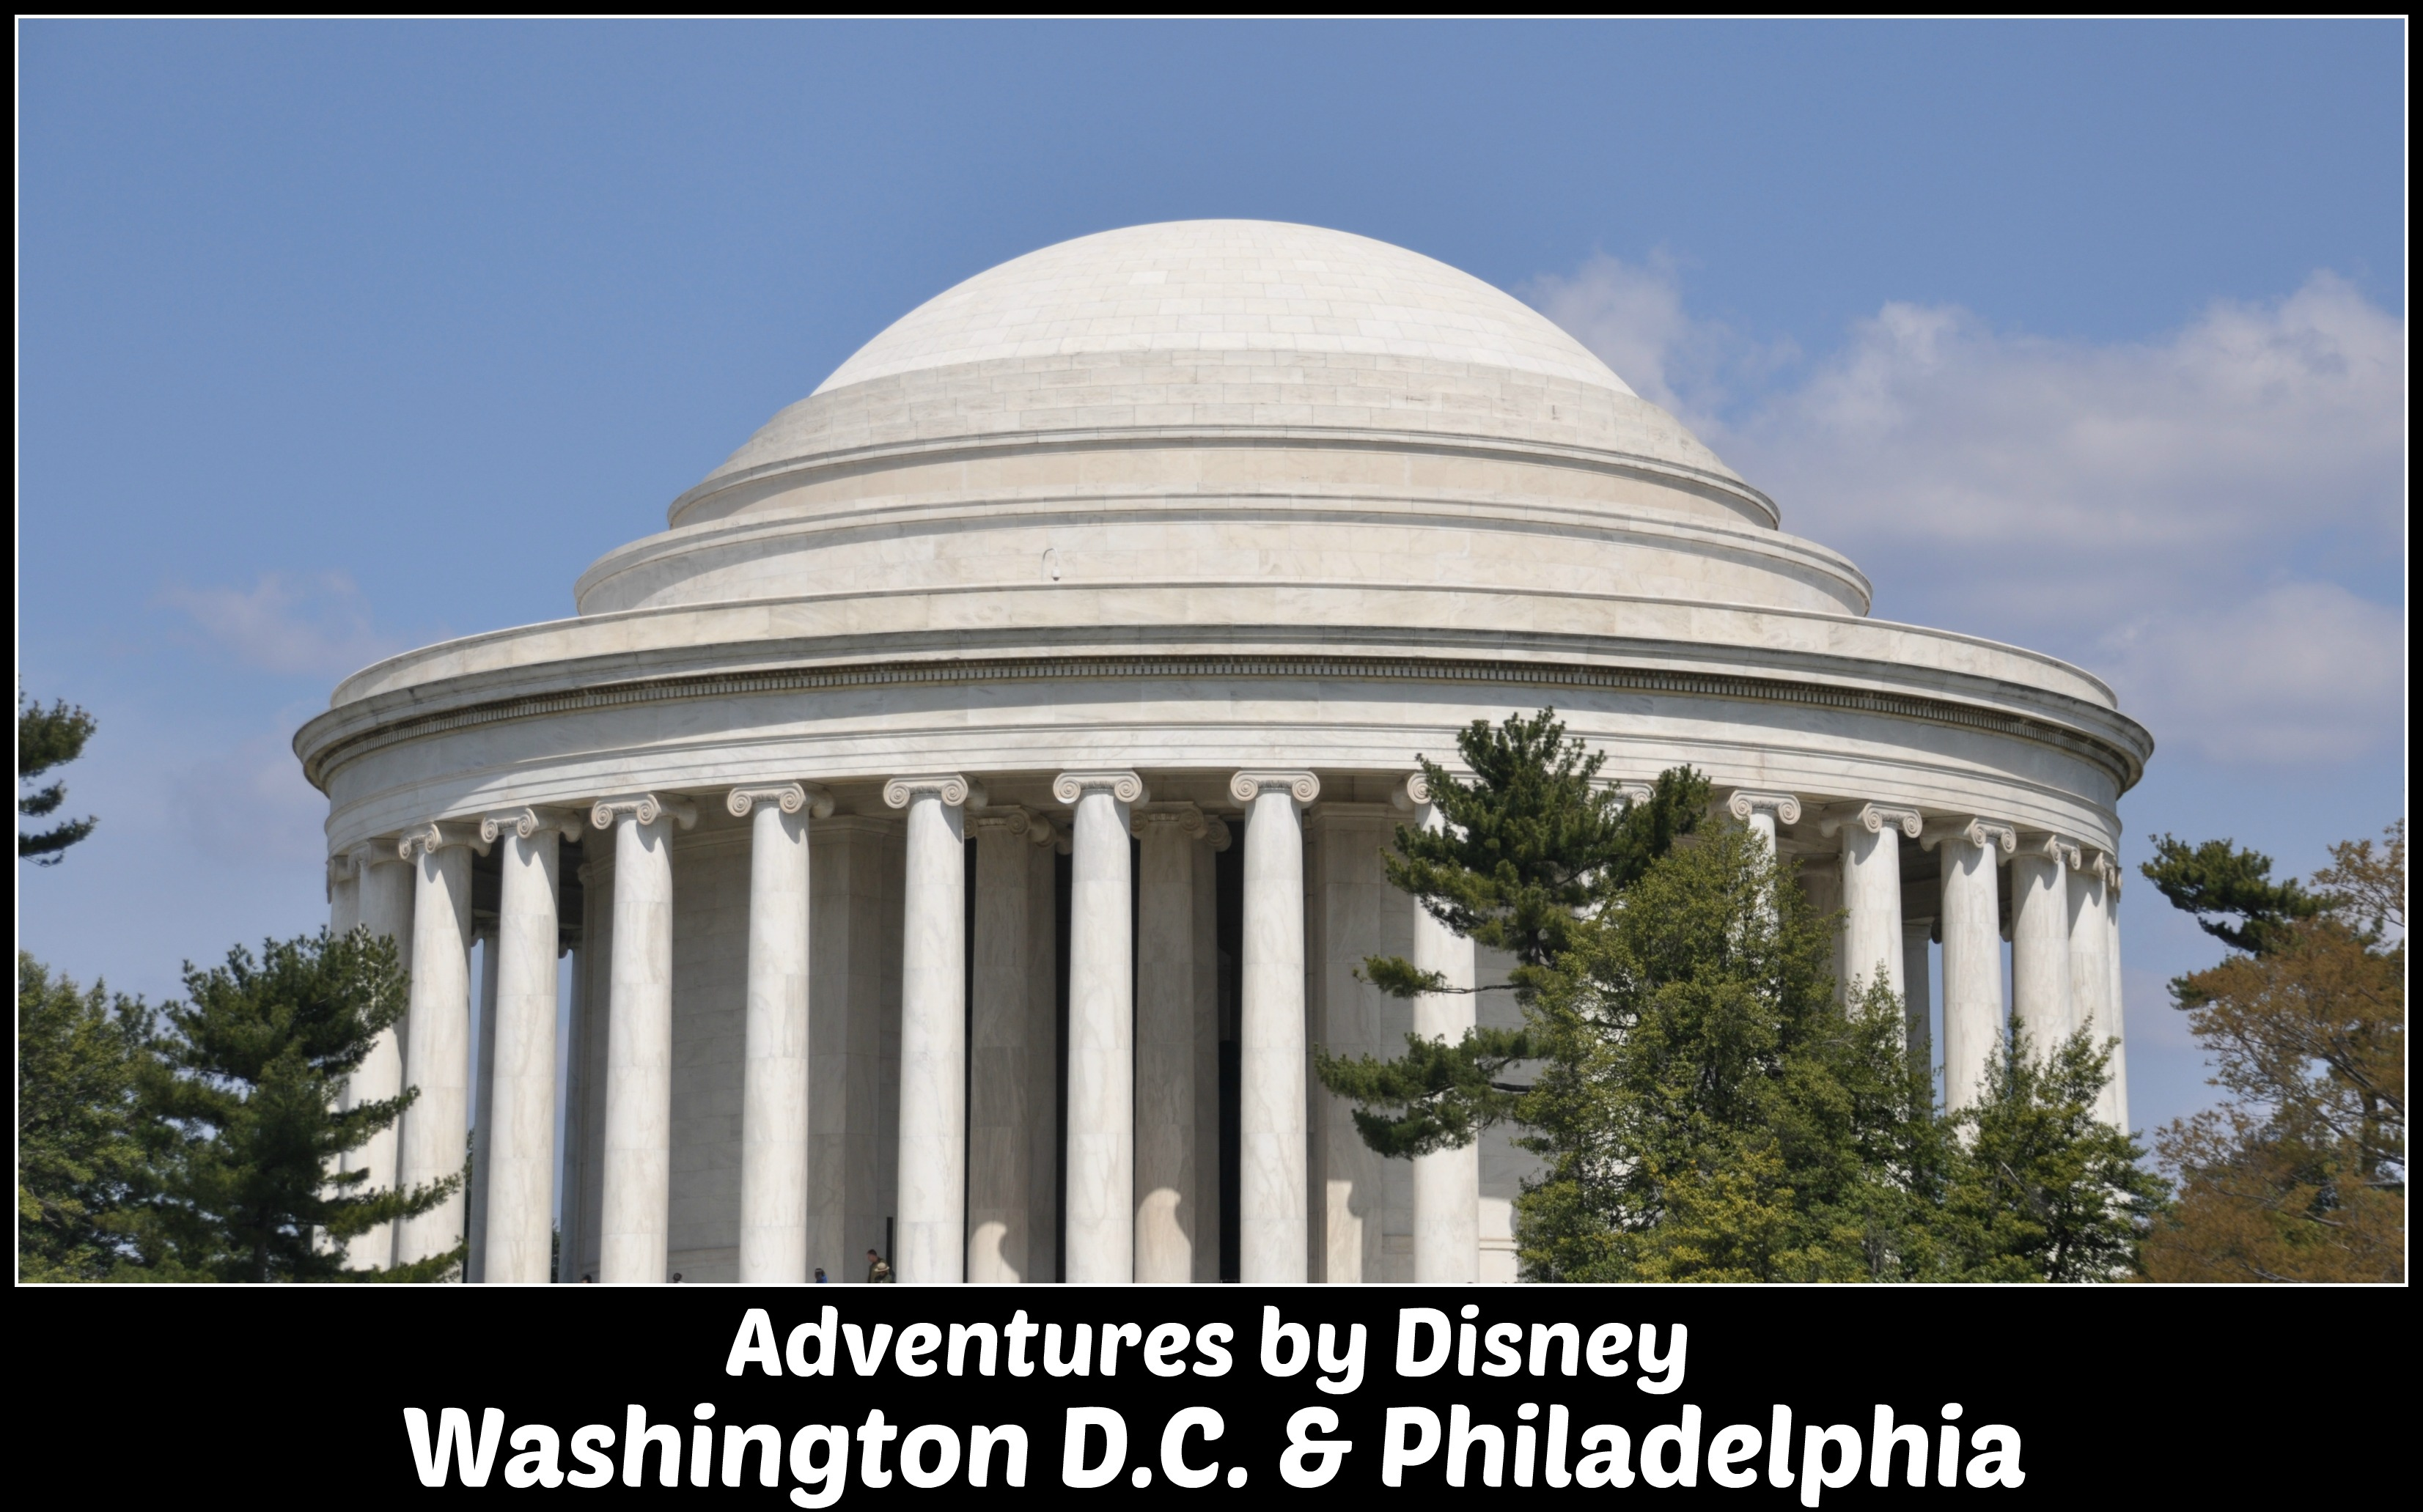 Adventures by Disney Washington D.C. and Philadelphia guided tour